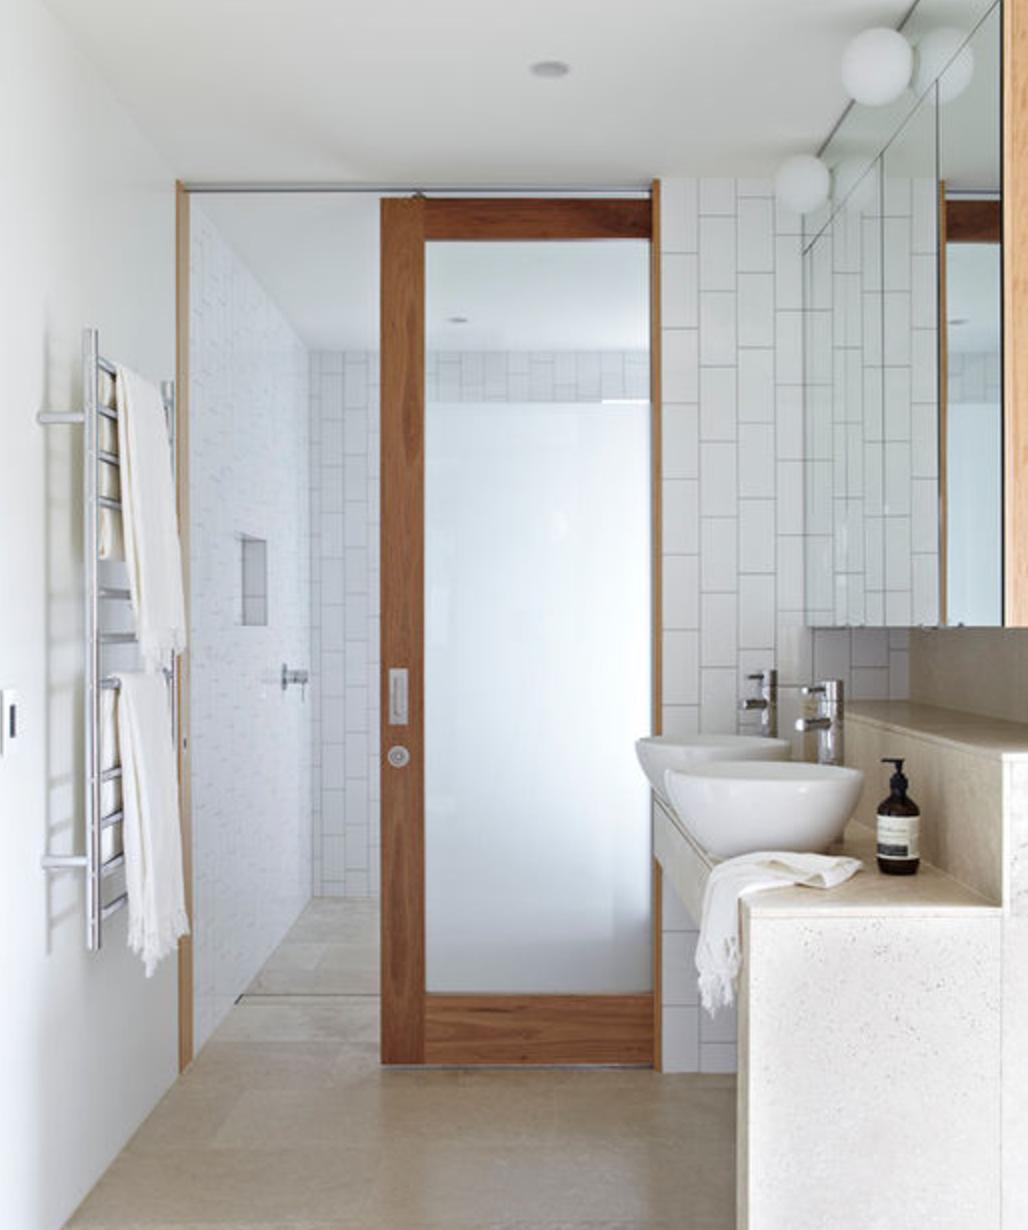 Sliding Door W Translucent Glass Sliding Bathroom Doors Sliding Door Design Pocket Doors Bathroom